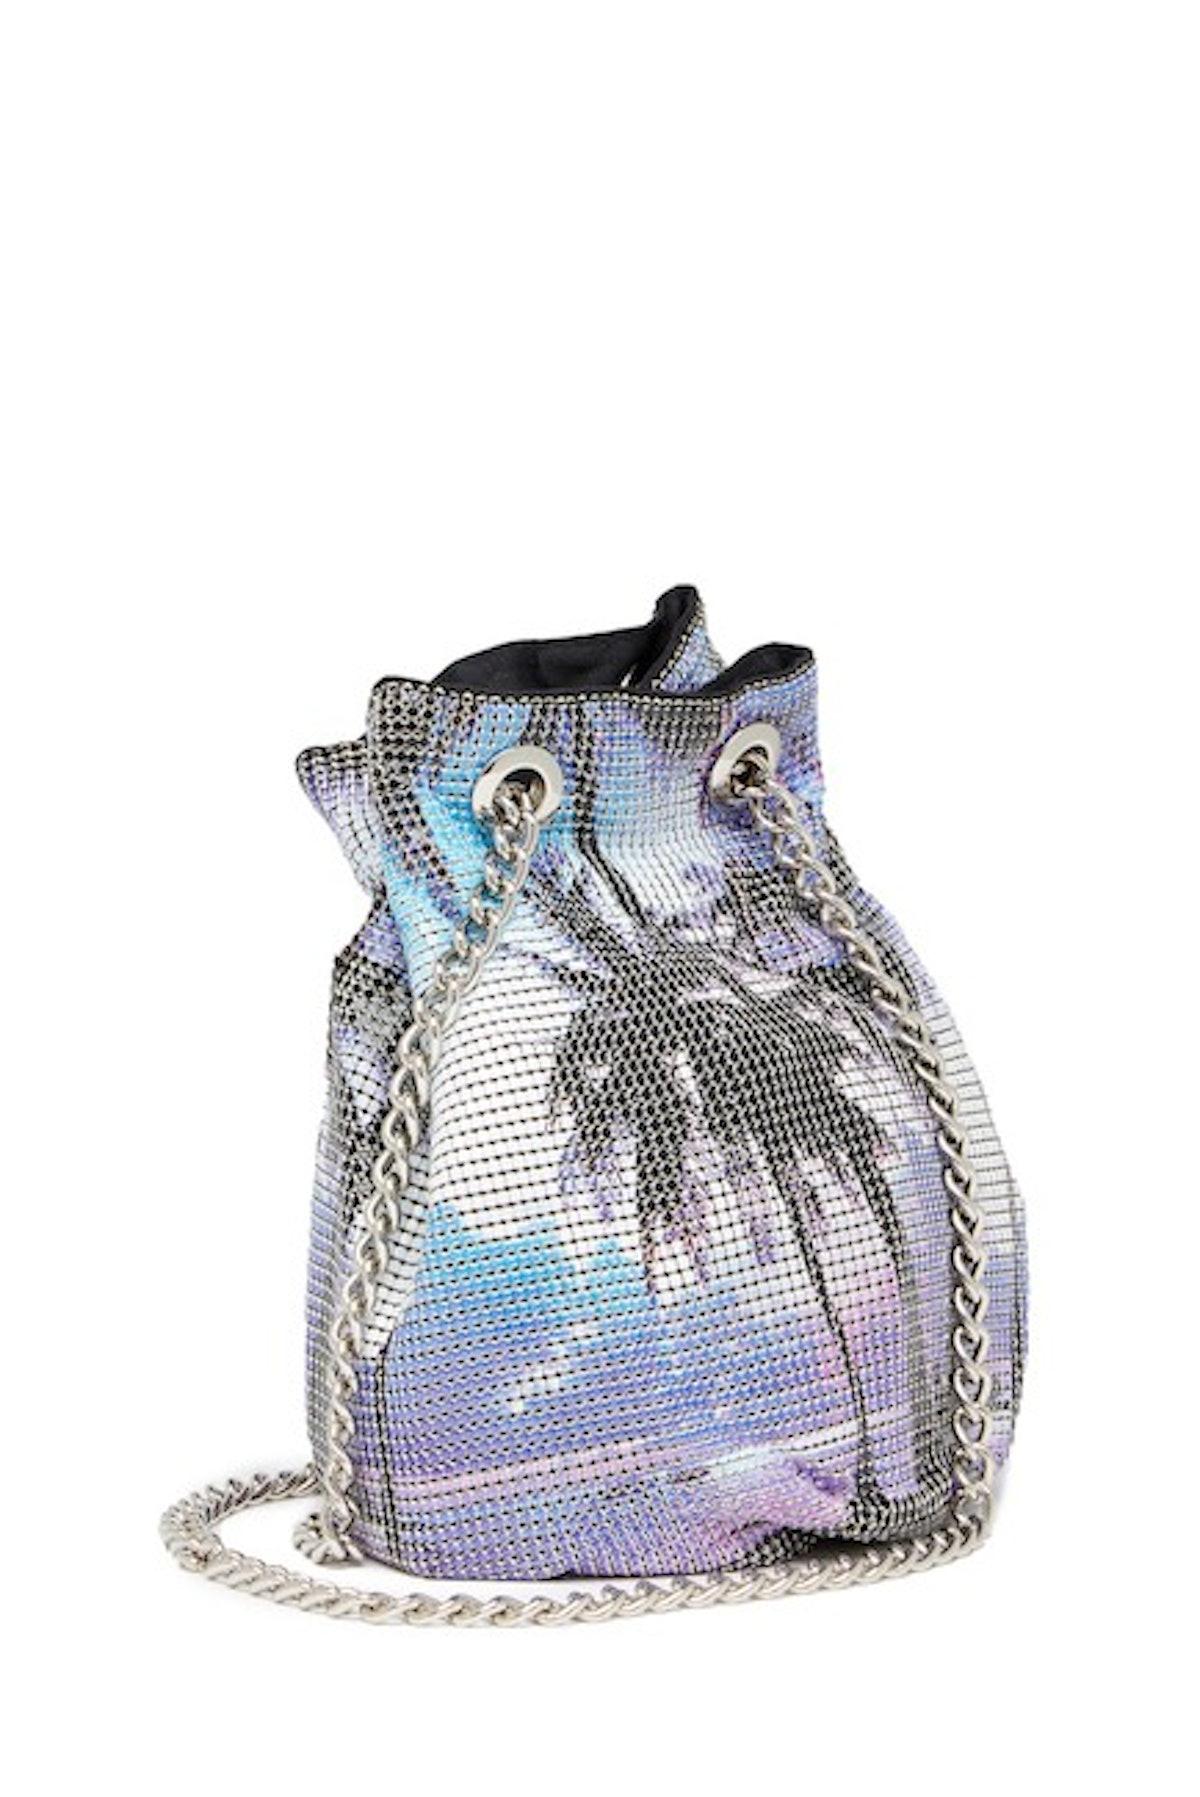 Whiting & Davis Multi Palms Crossbody Bucket Bag